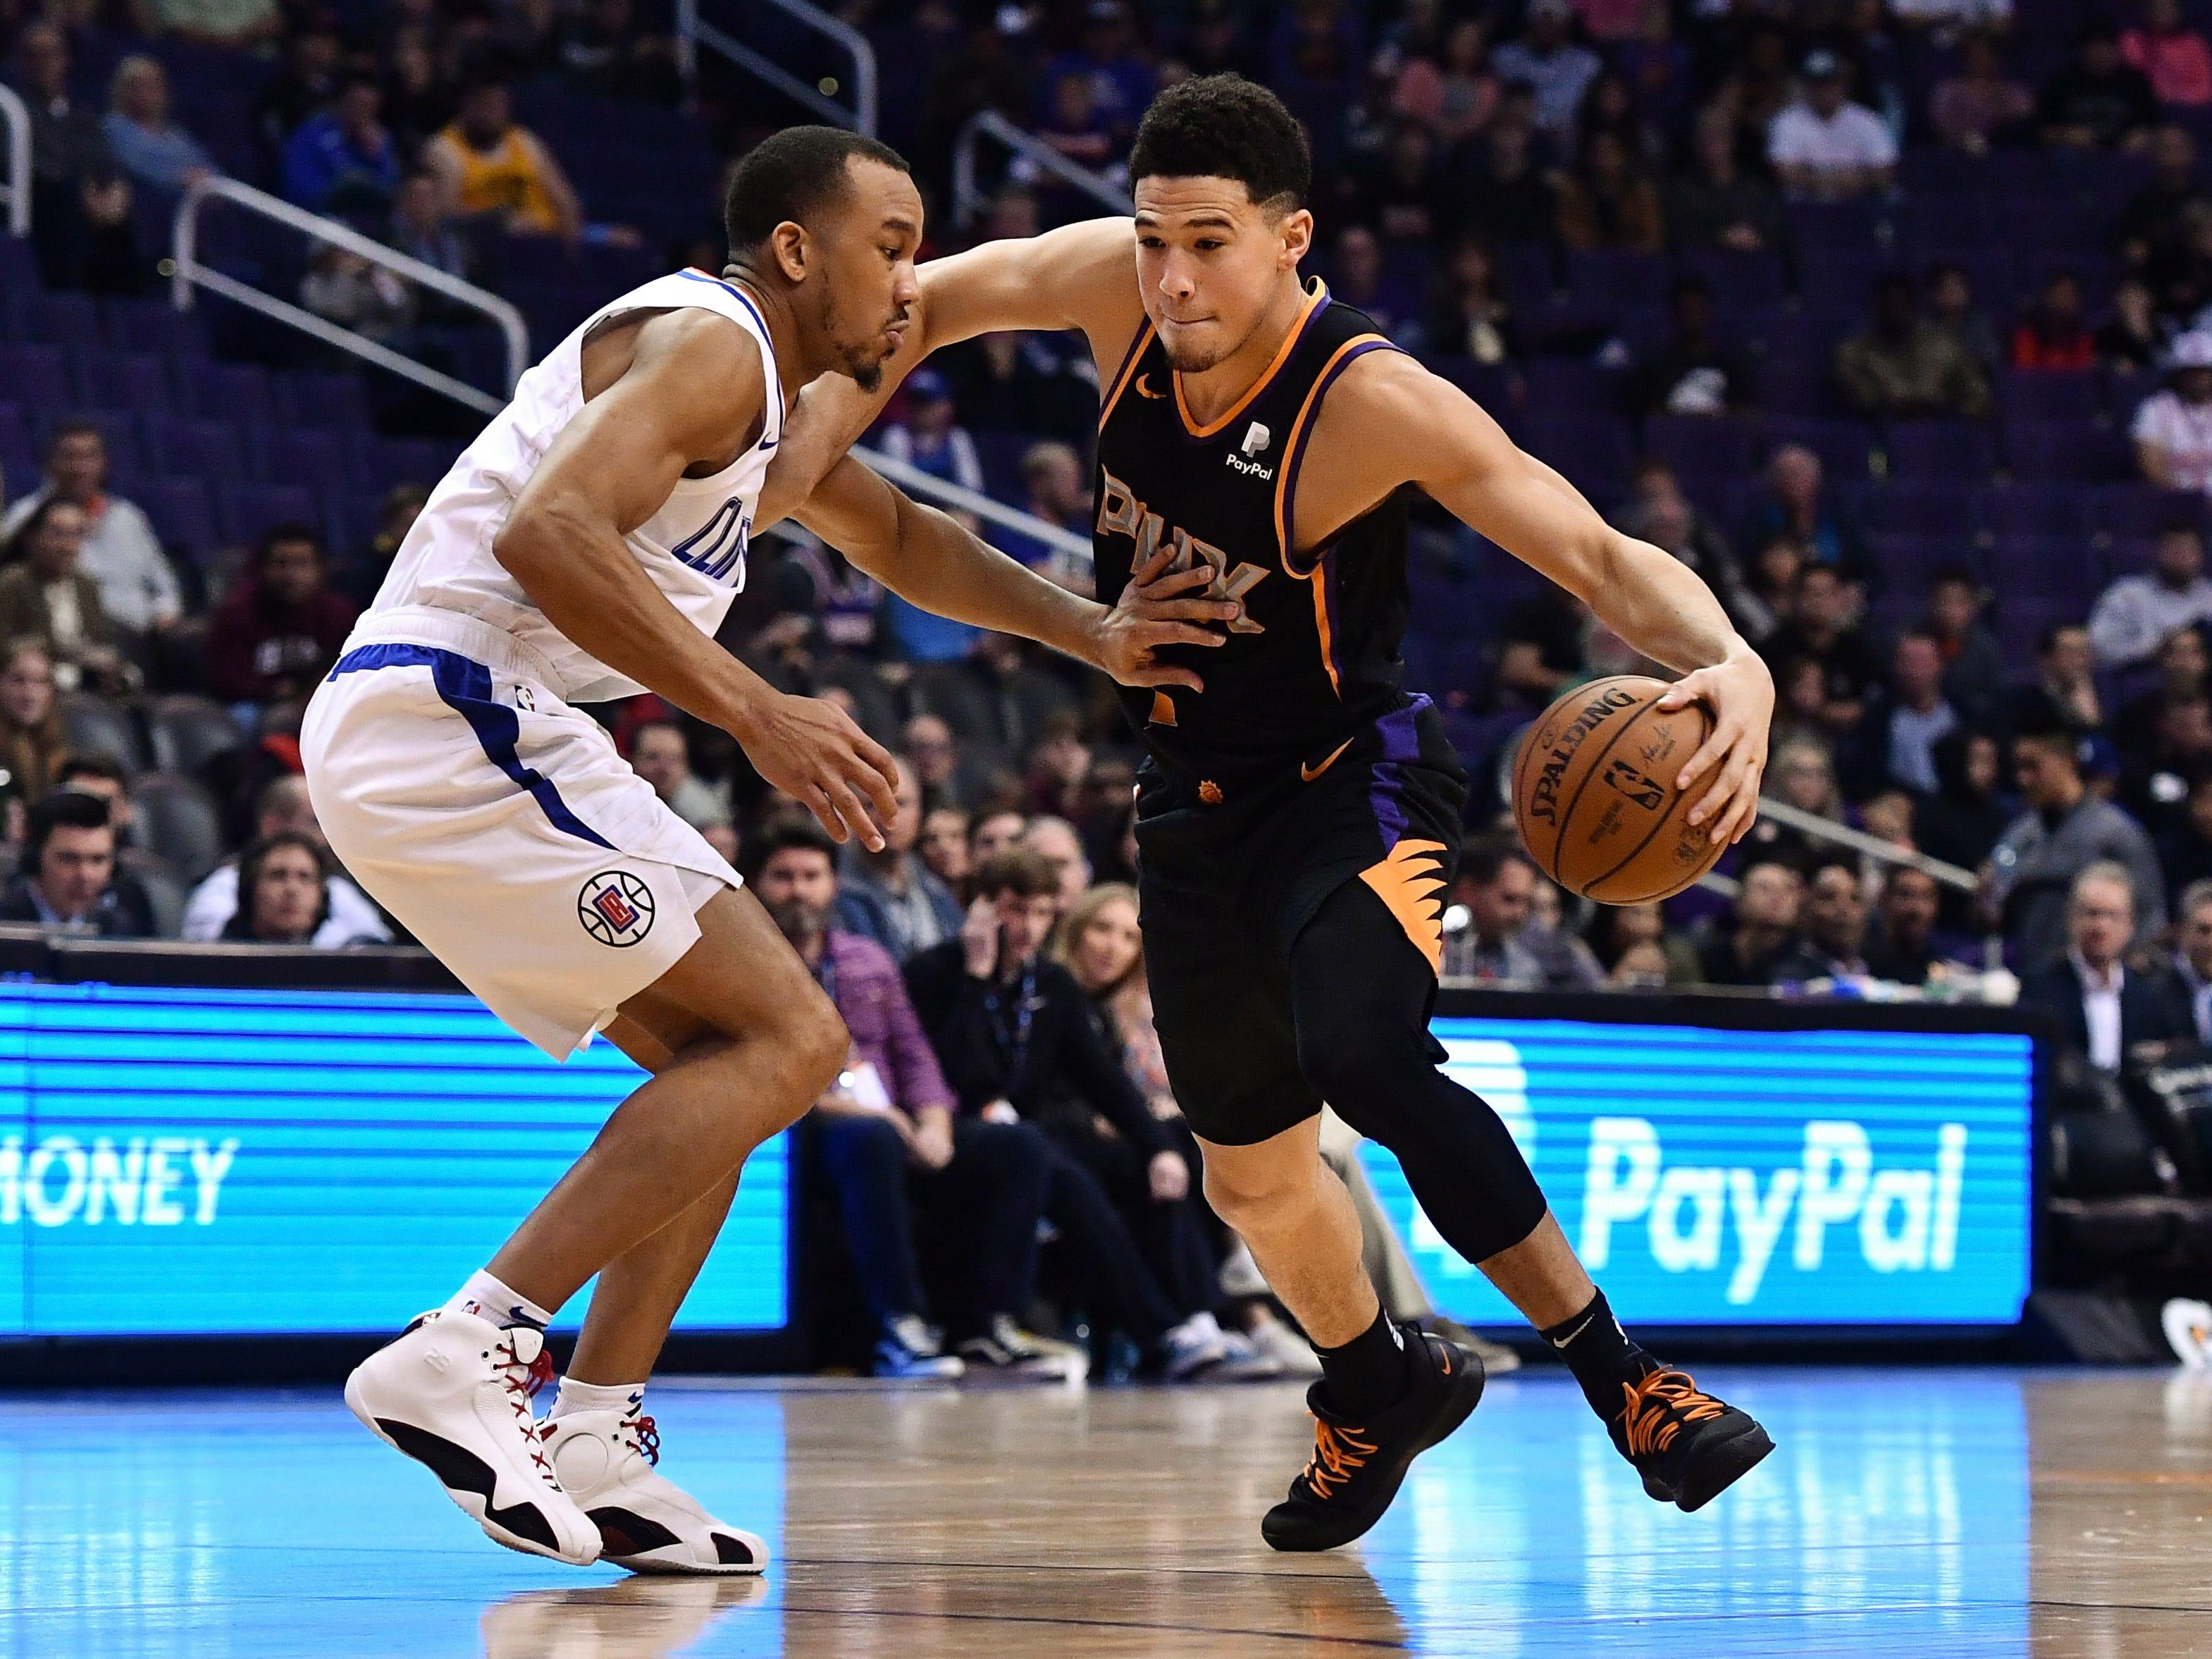 Jan 4, 2019; Phoenix, AZ, USA; Phoenix Suns guard Devin Booker (1) handles the ball against LA Clippers guard Avery Bradley (11) in the first half at Talking Stick Resort Arena. Mandatory Credit: Jennifer Stewart-USA TODAY Sports